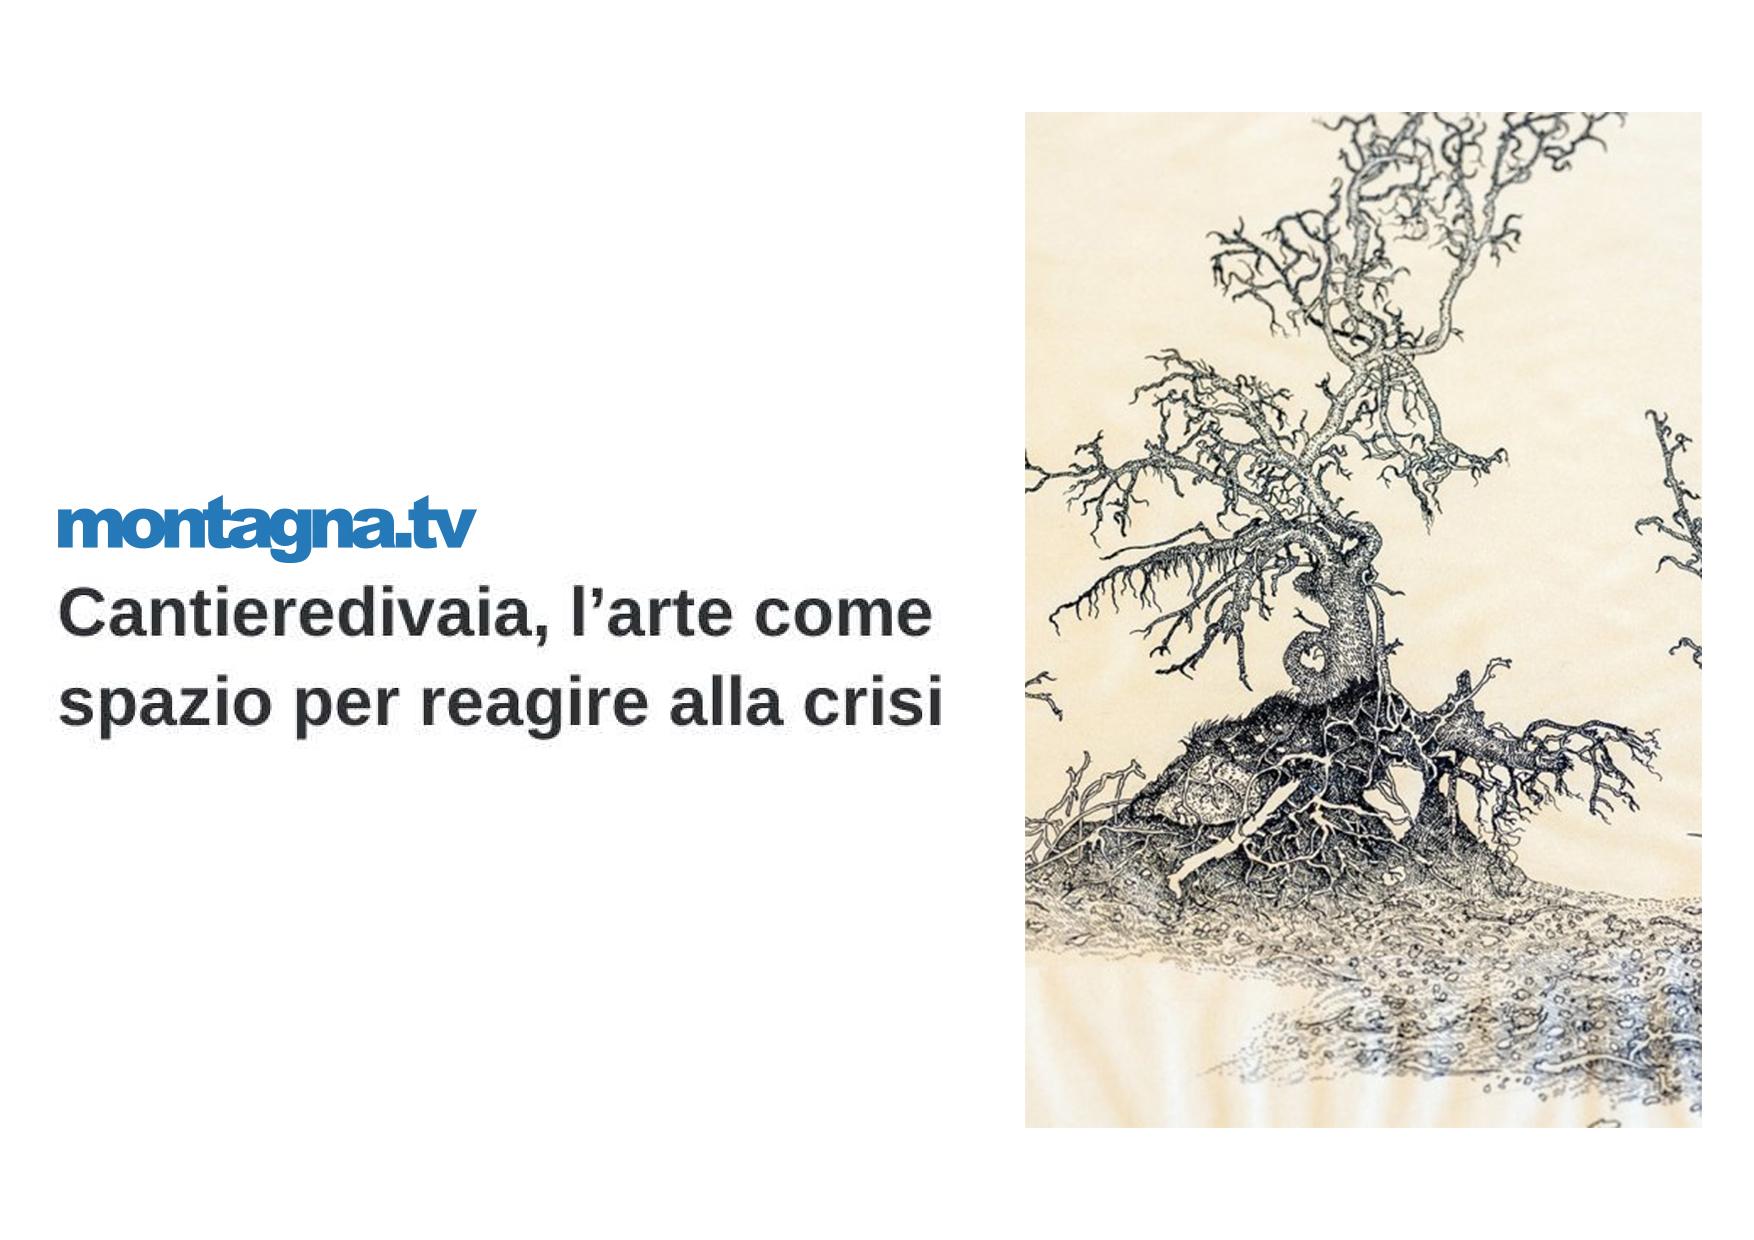 21 novembre - Montagna TV